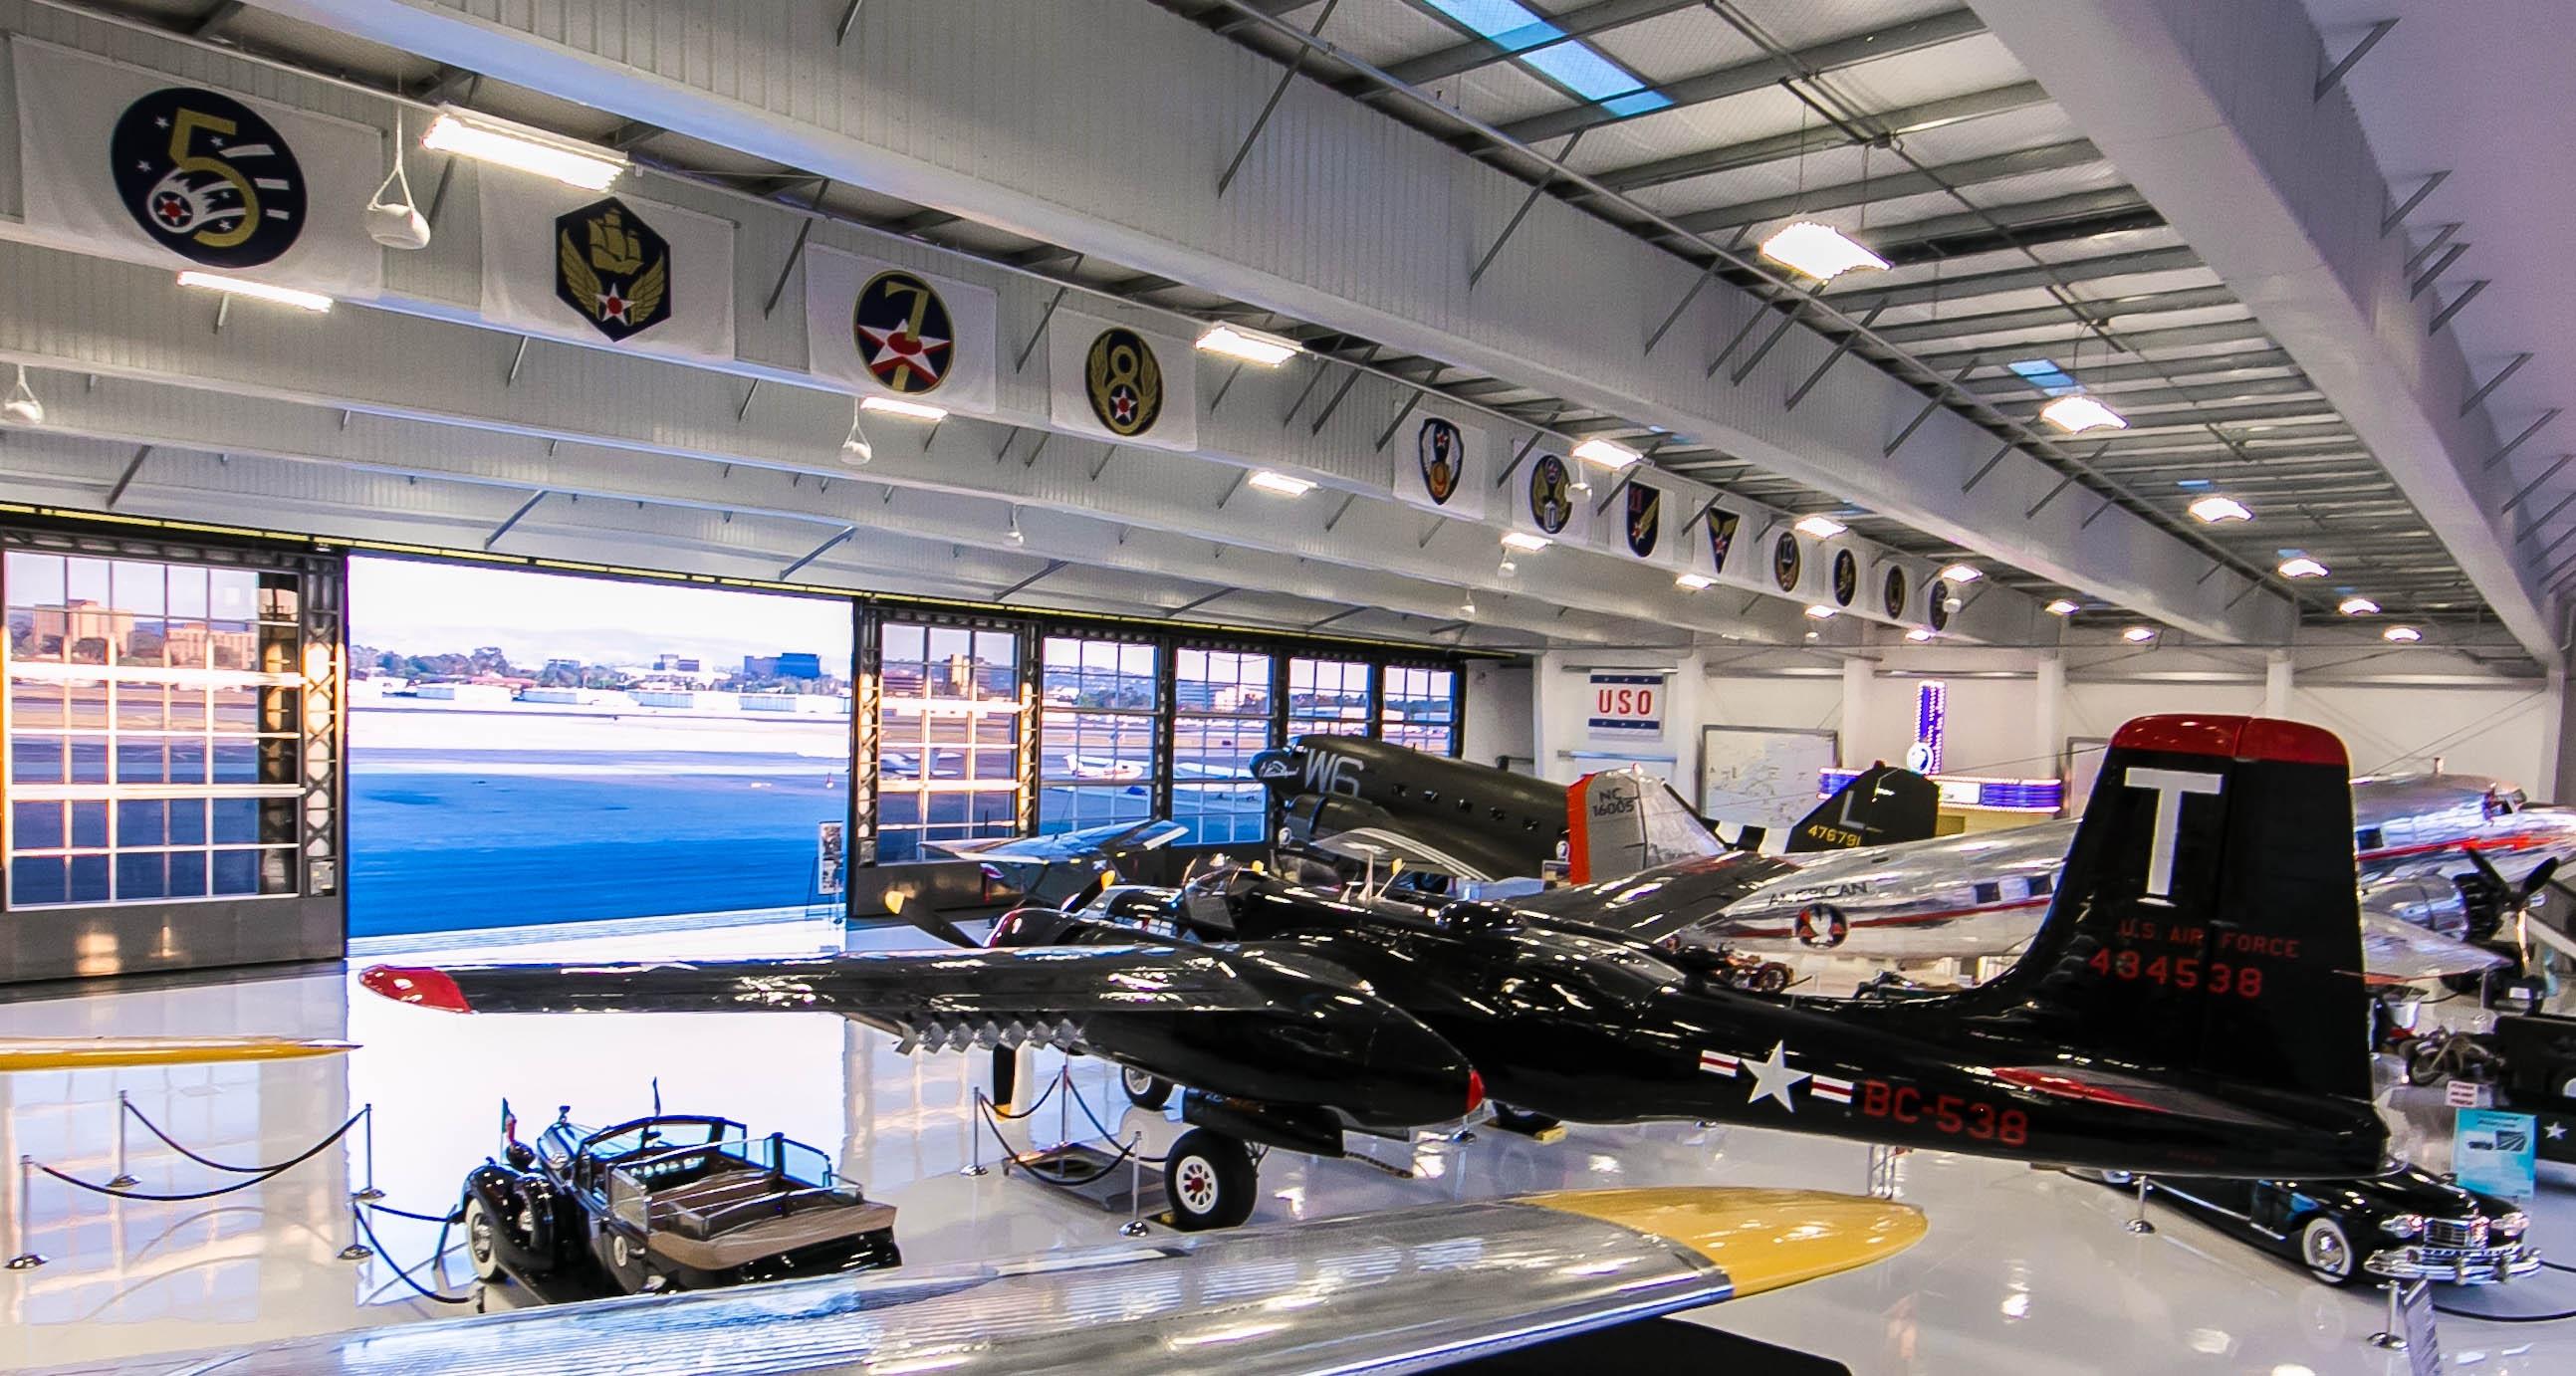 Aircraft hanger at Air Combat School